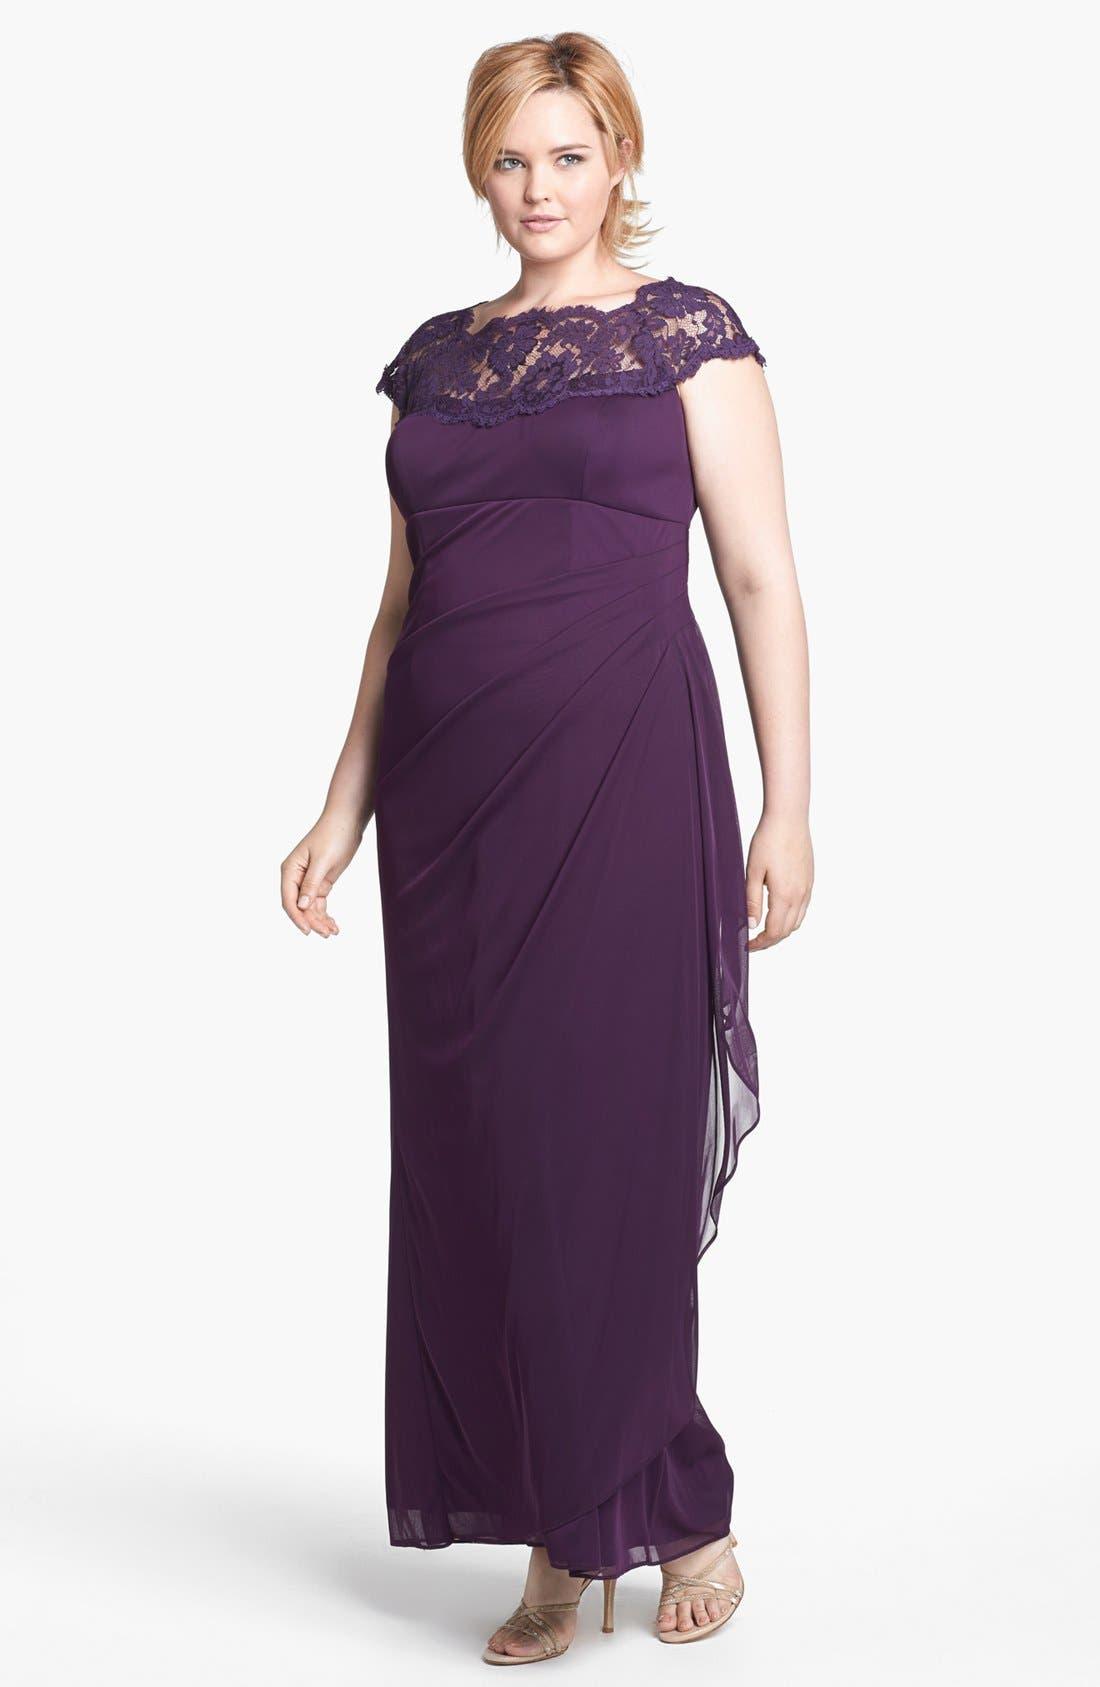 Alternate Image 1 Selected - Xscape Lace Yoke Mesh Gown (Plus Size)